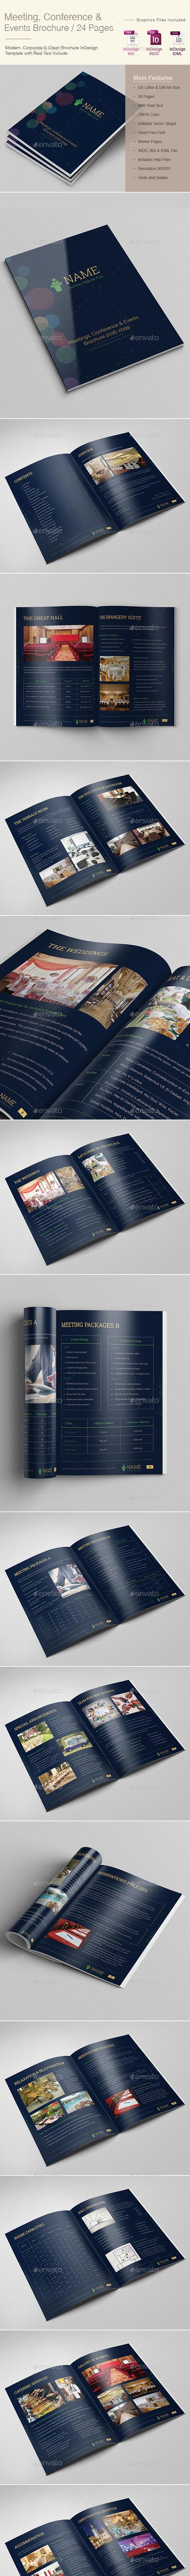 Meetings Conference & Events Brochure - Corporate Brochures